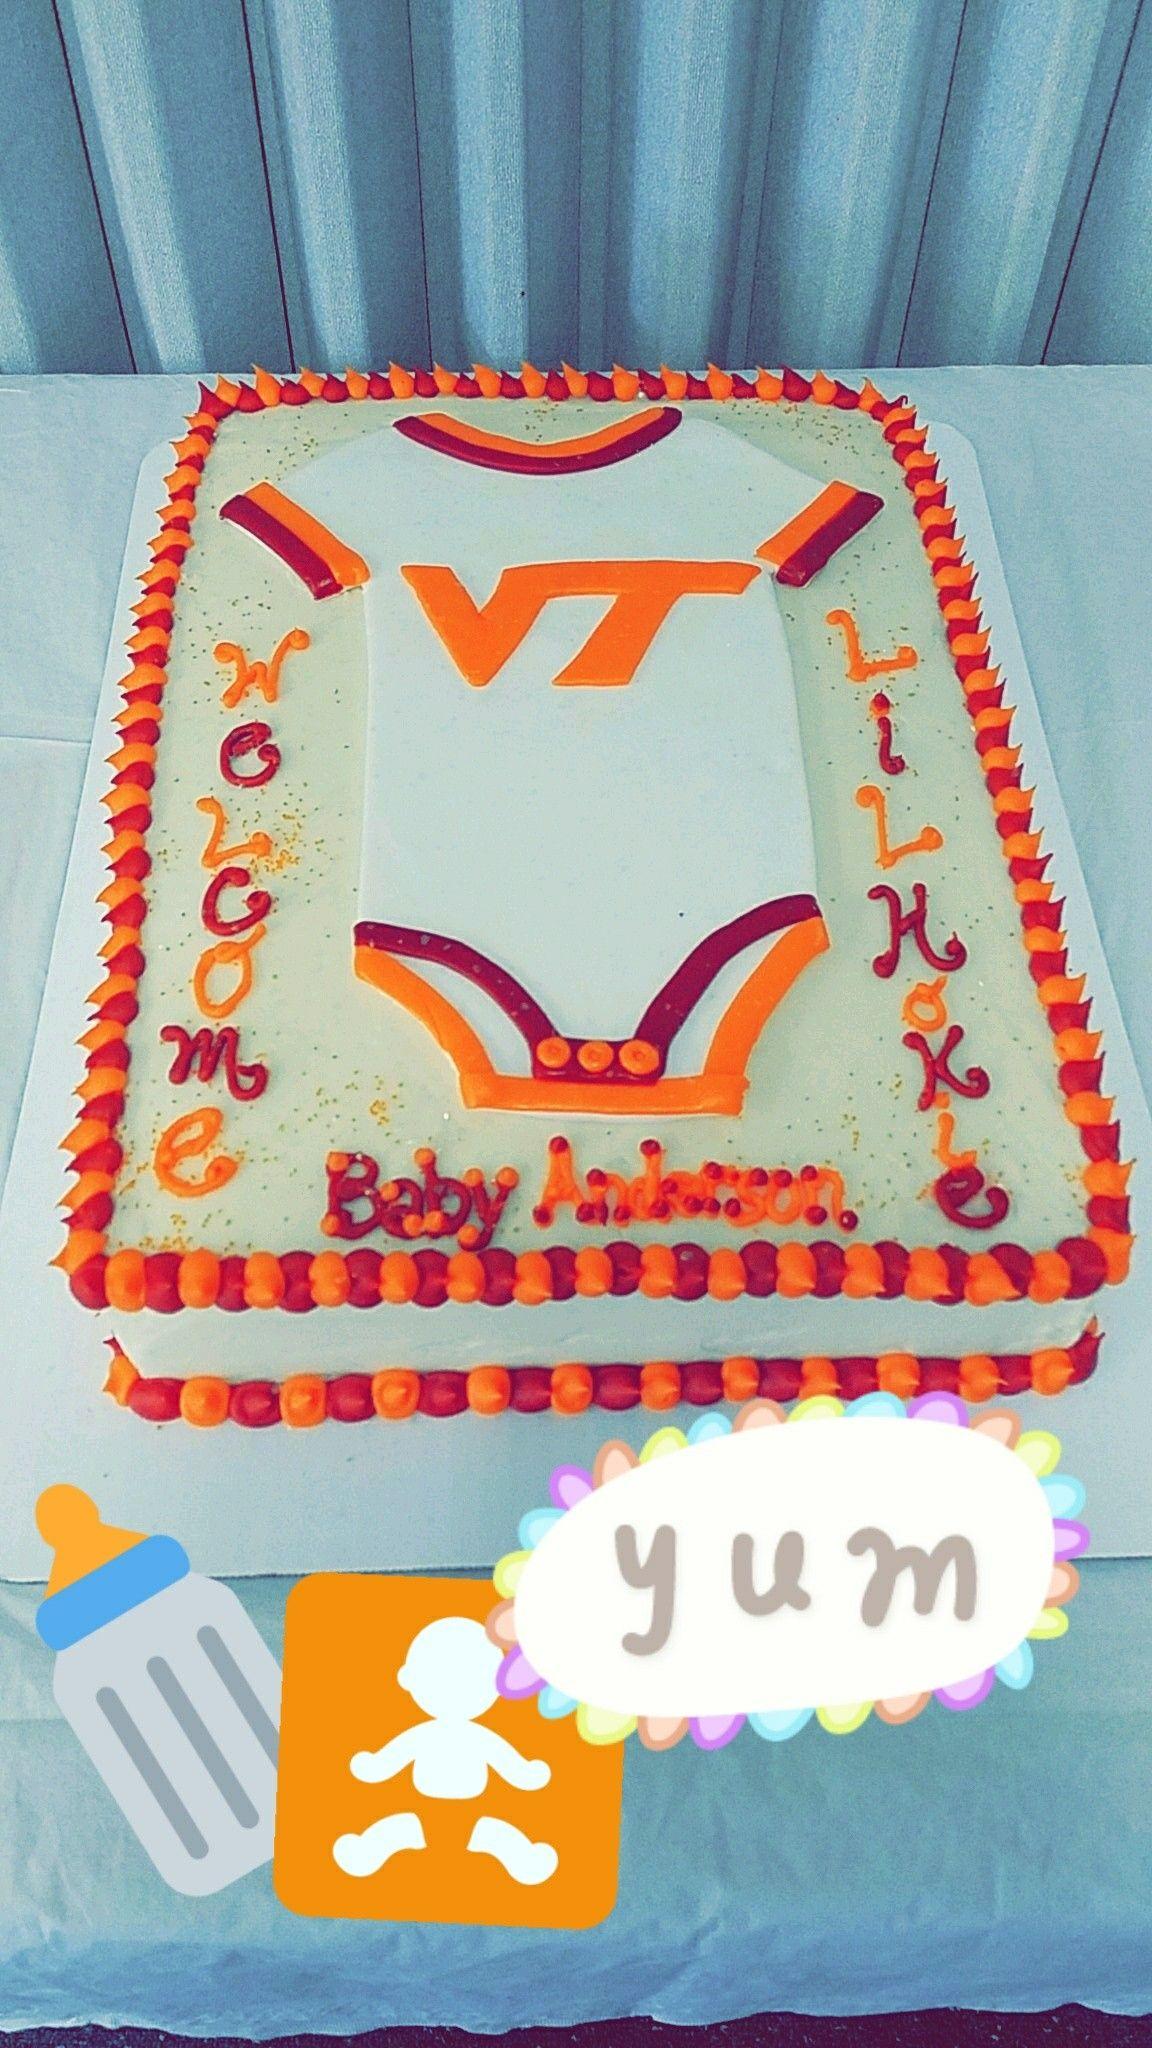 Virginia Tech Baby shower cake Hokie baby Hokie nation